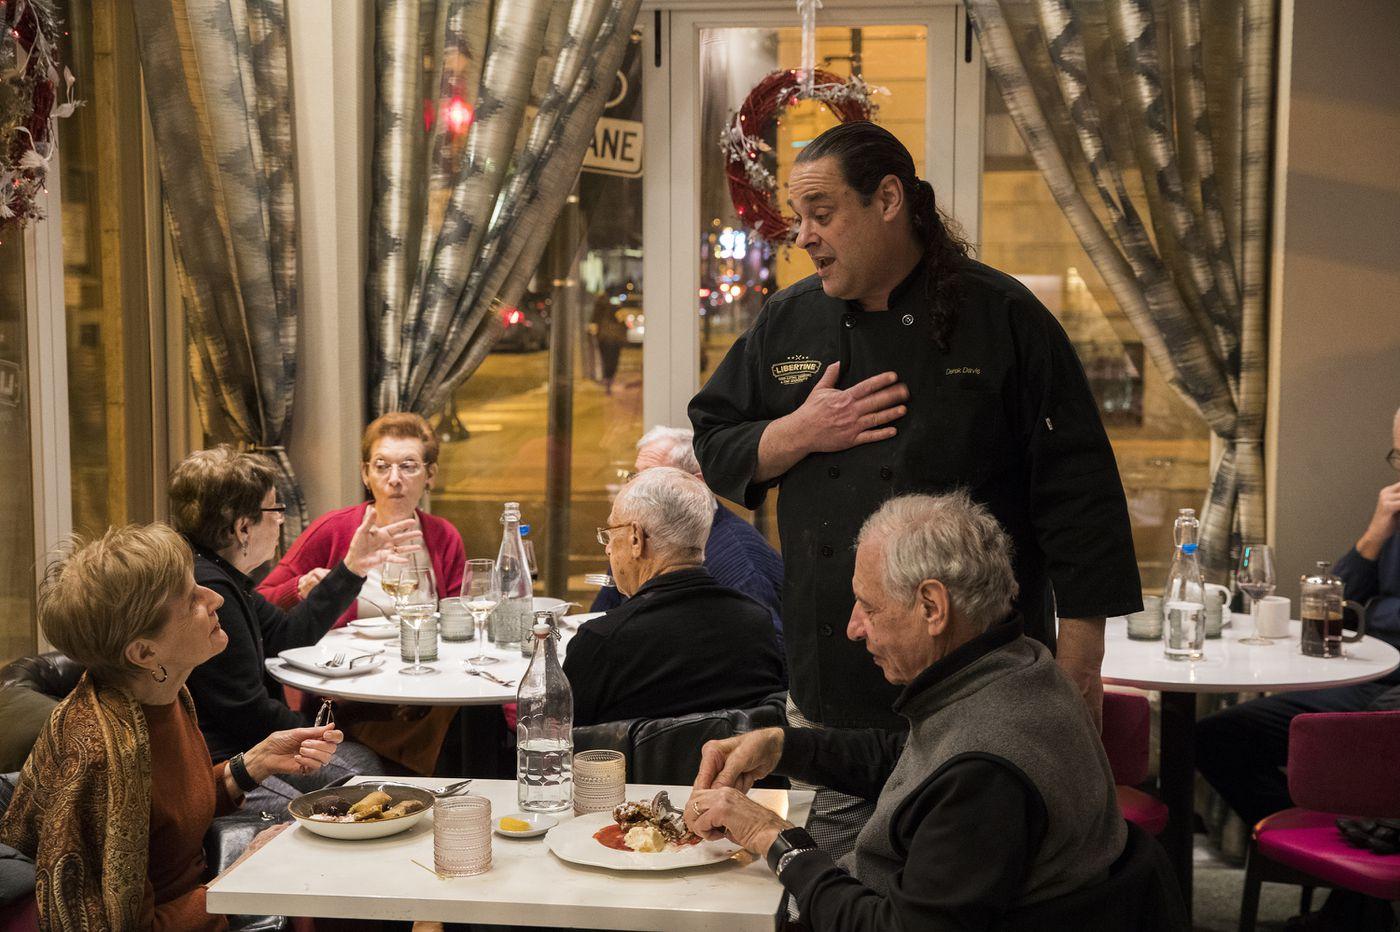 Libertine is chef Derek Davis' comeback, and a breath of new life for Center City corner